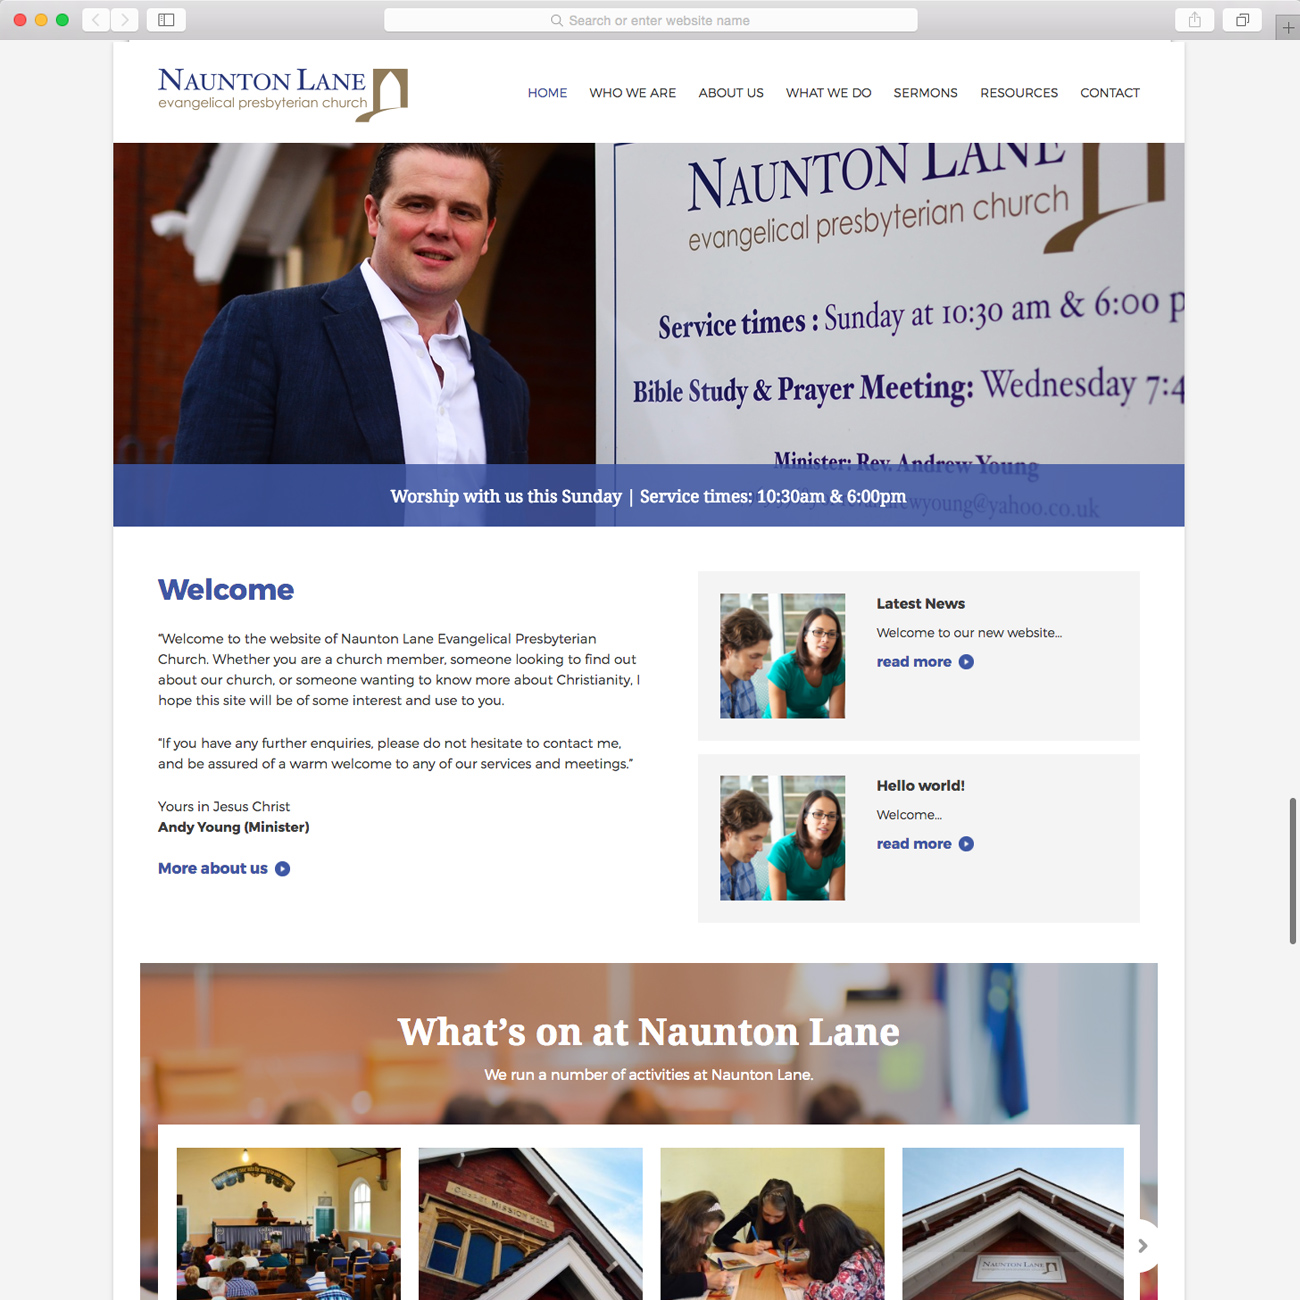 Naunton Lane Evangelical Presbyterian Church